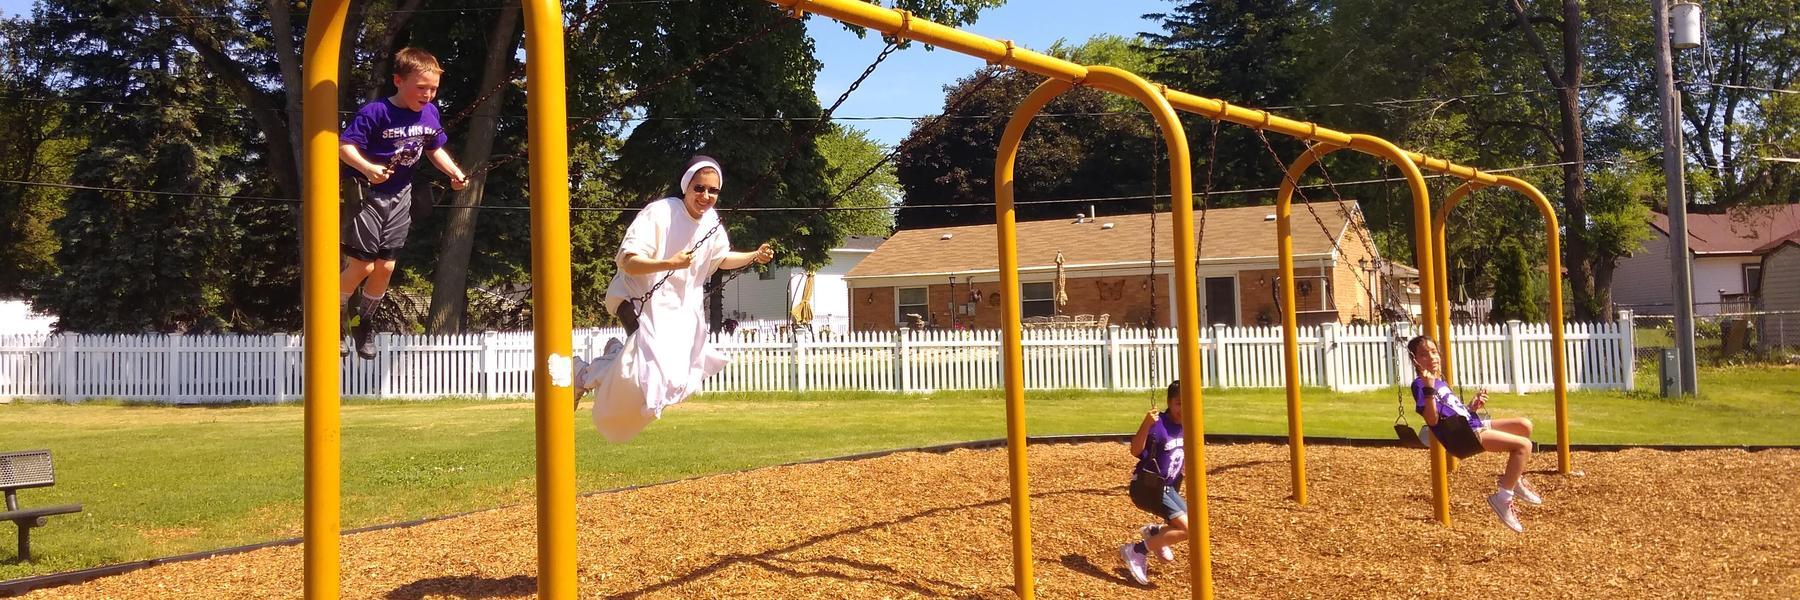 Sister Swinging